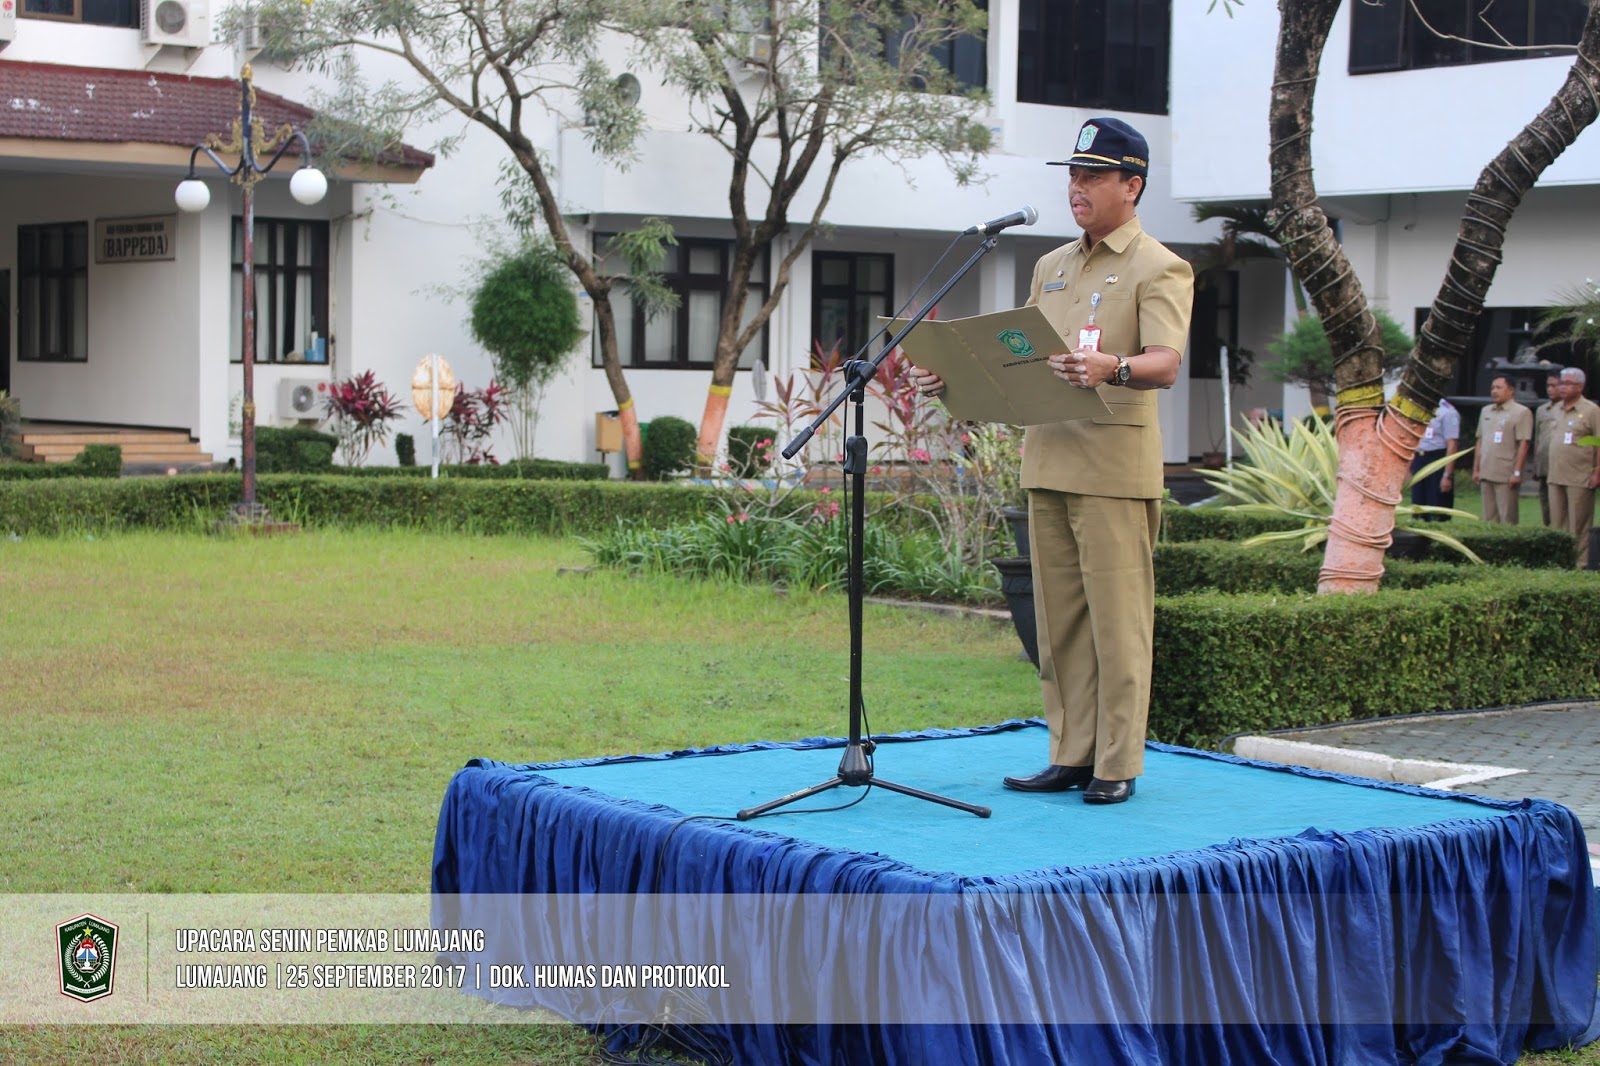 Press Release Humas Protokol Pemkab Lumajang 25 September 2017 Kolam